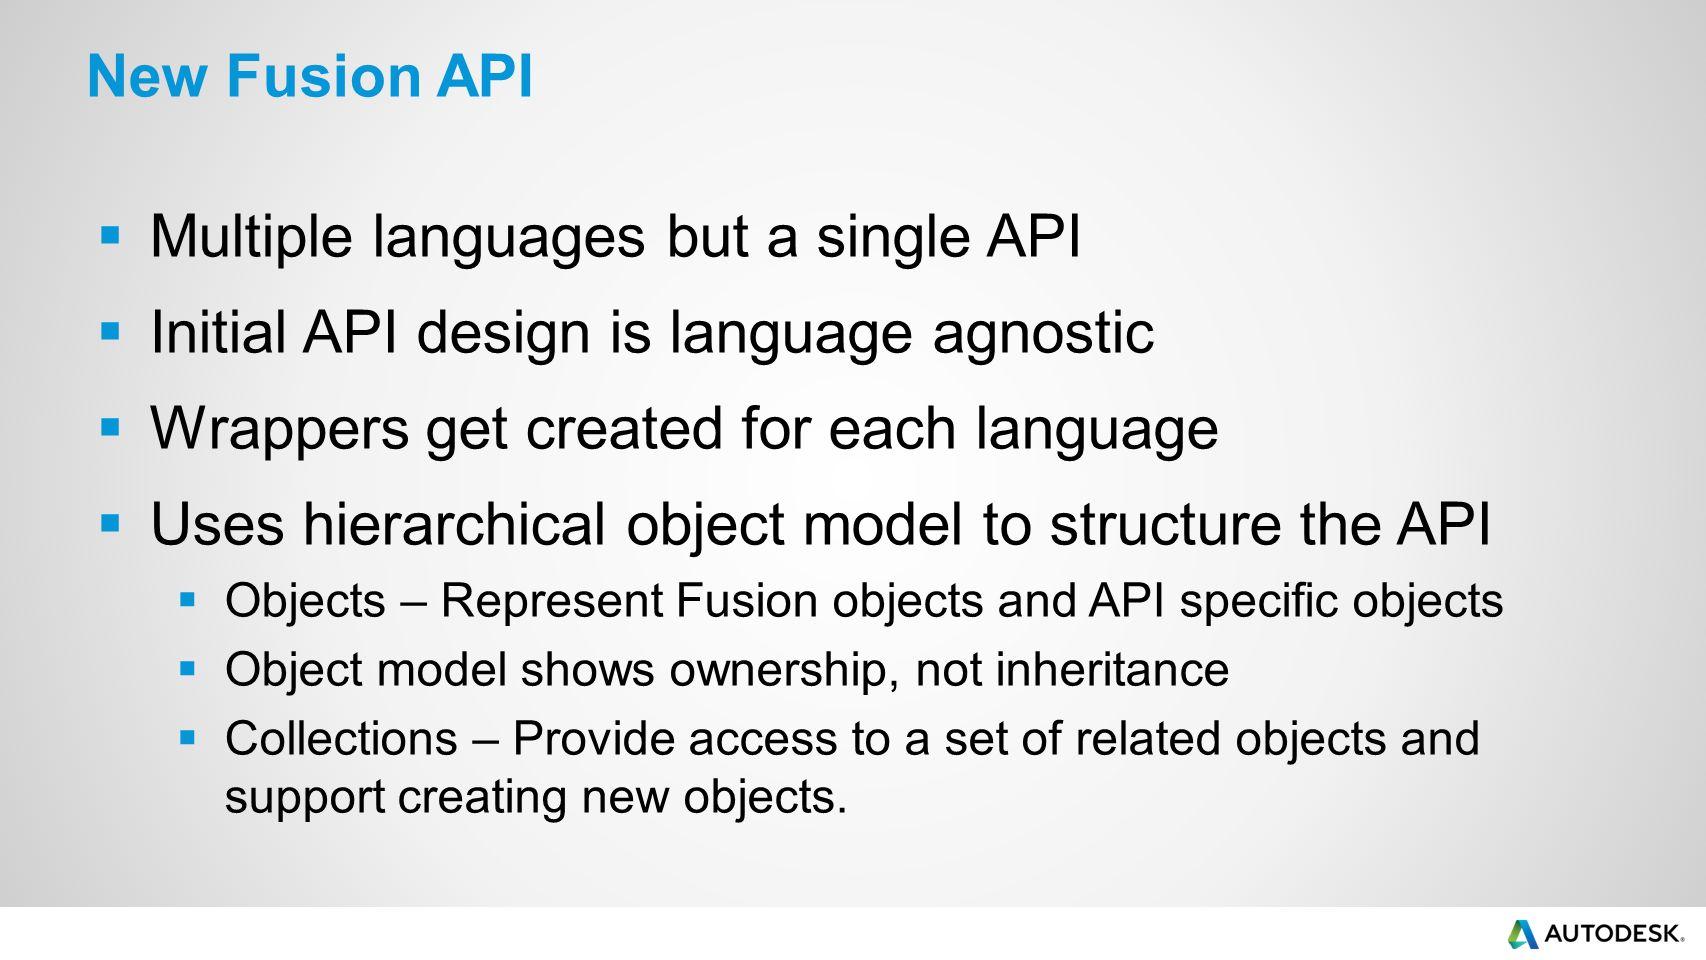 Multiple languages but a single API